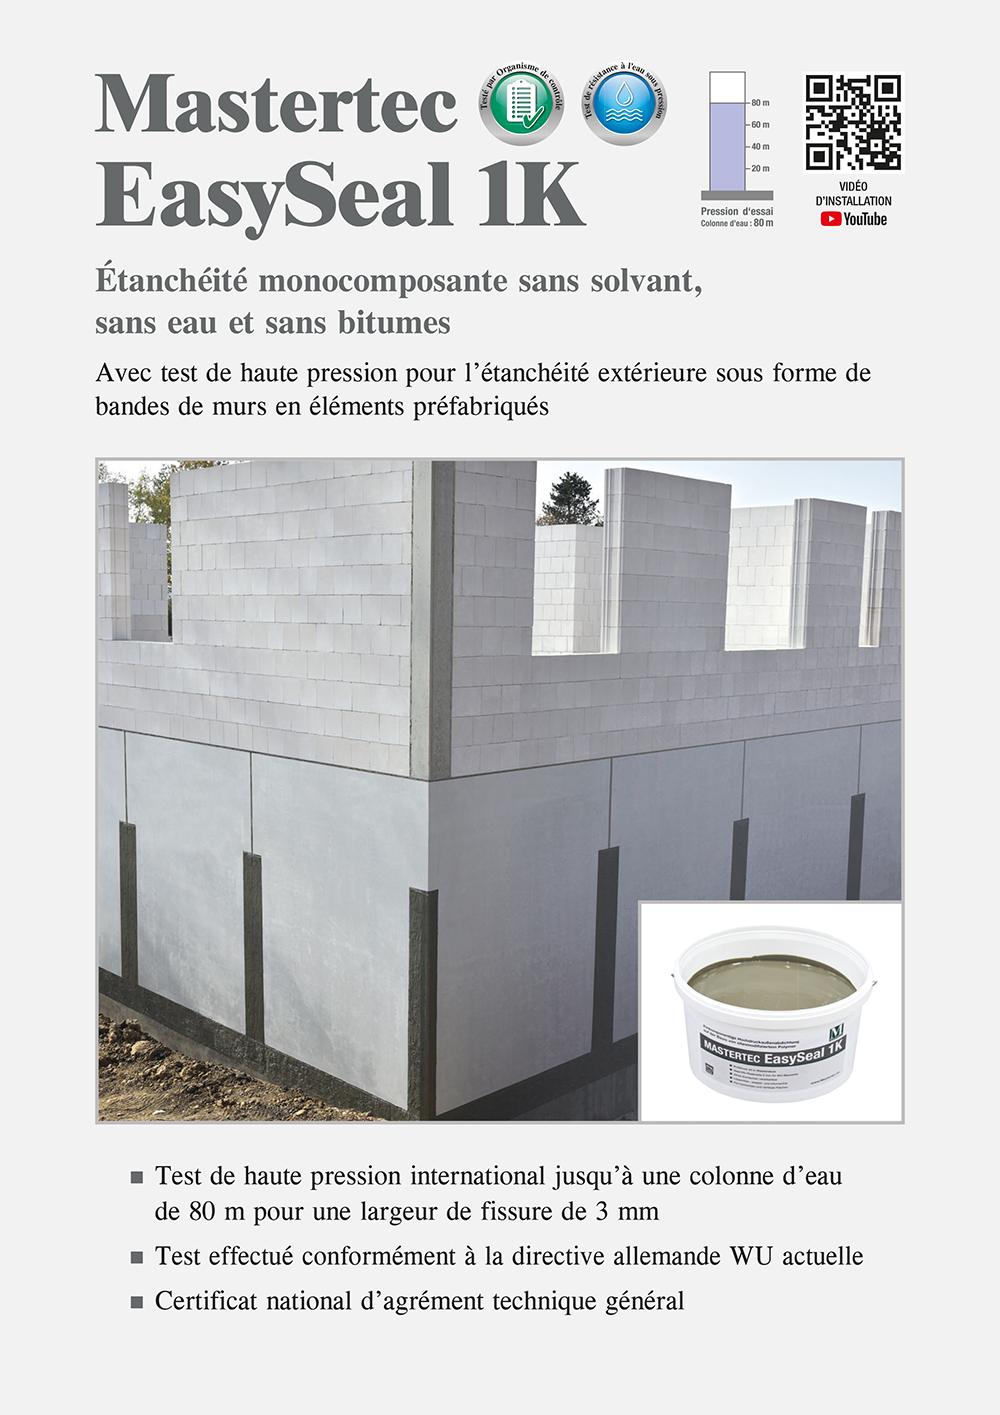 Prospekt Mastertec EasySeal 1K